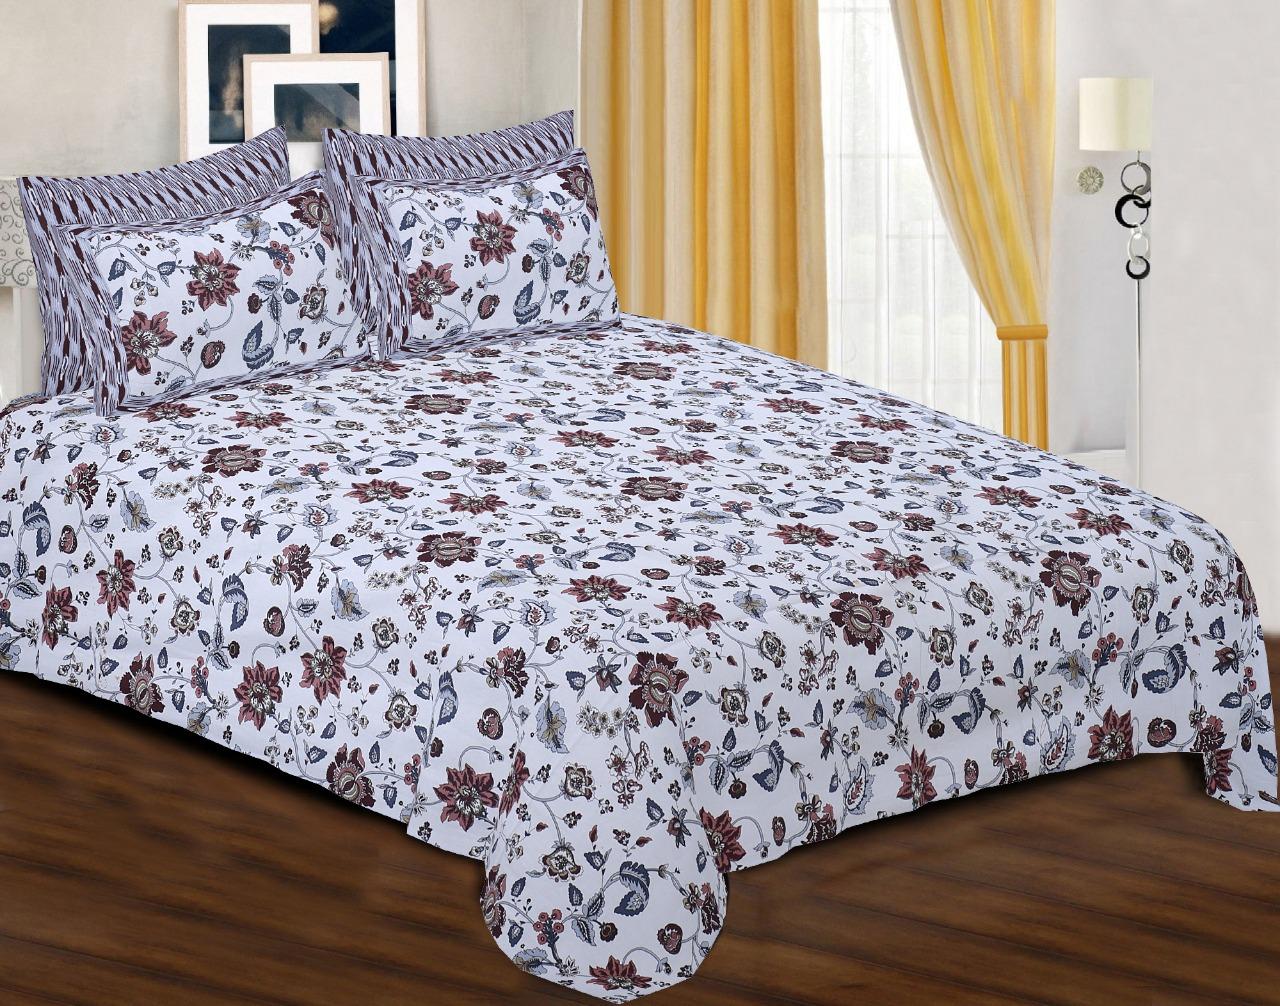 Pinkblock.in | Snowy Cotton Printed Bedsheet